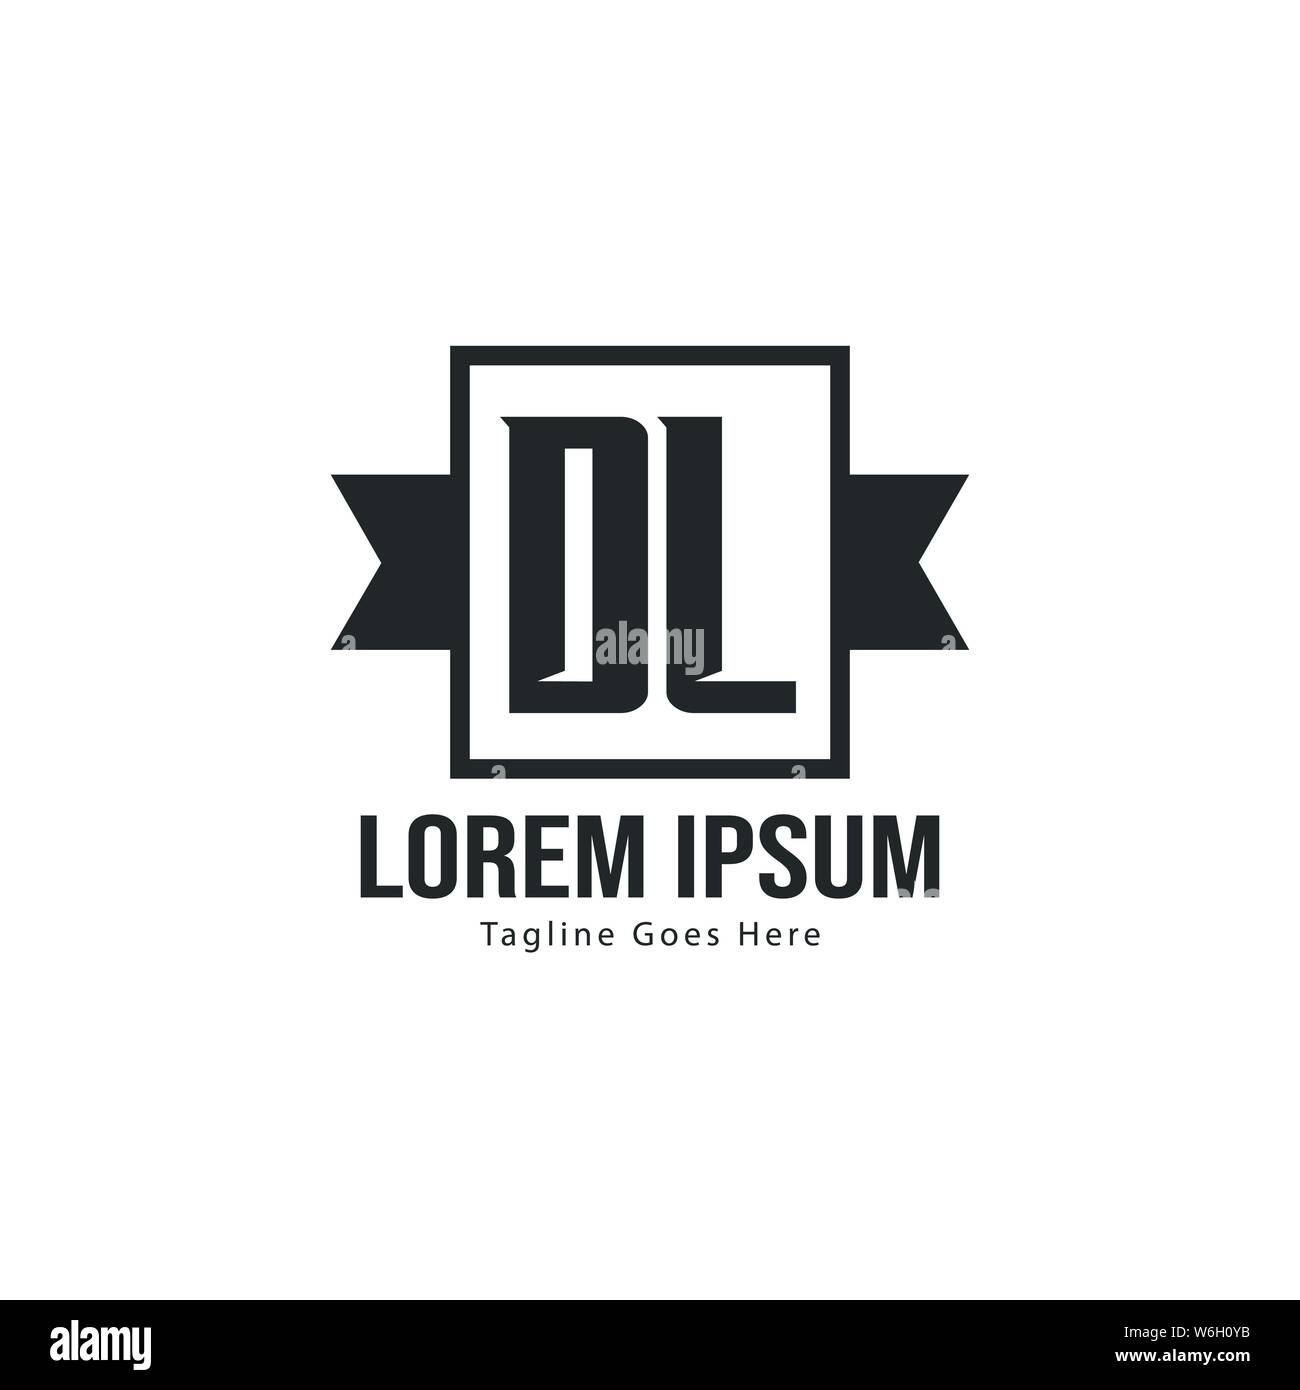 Initial Dl Logo Template With Modern Frame Minimalist Dl Letter Logo Vector Illustration Design Stock Vector Image Art Alamy